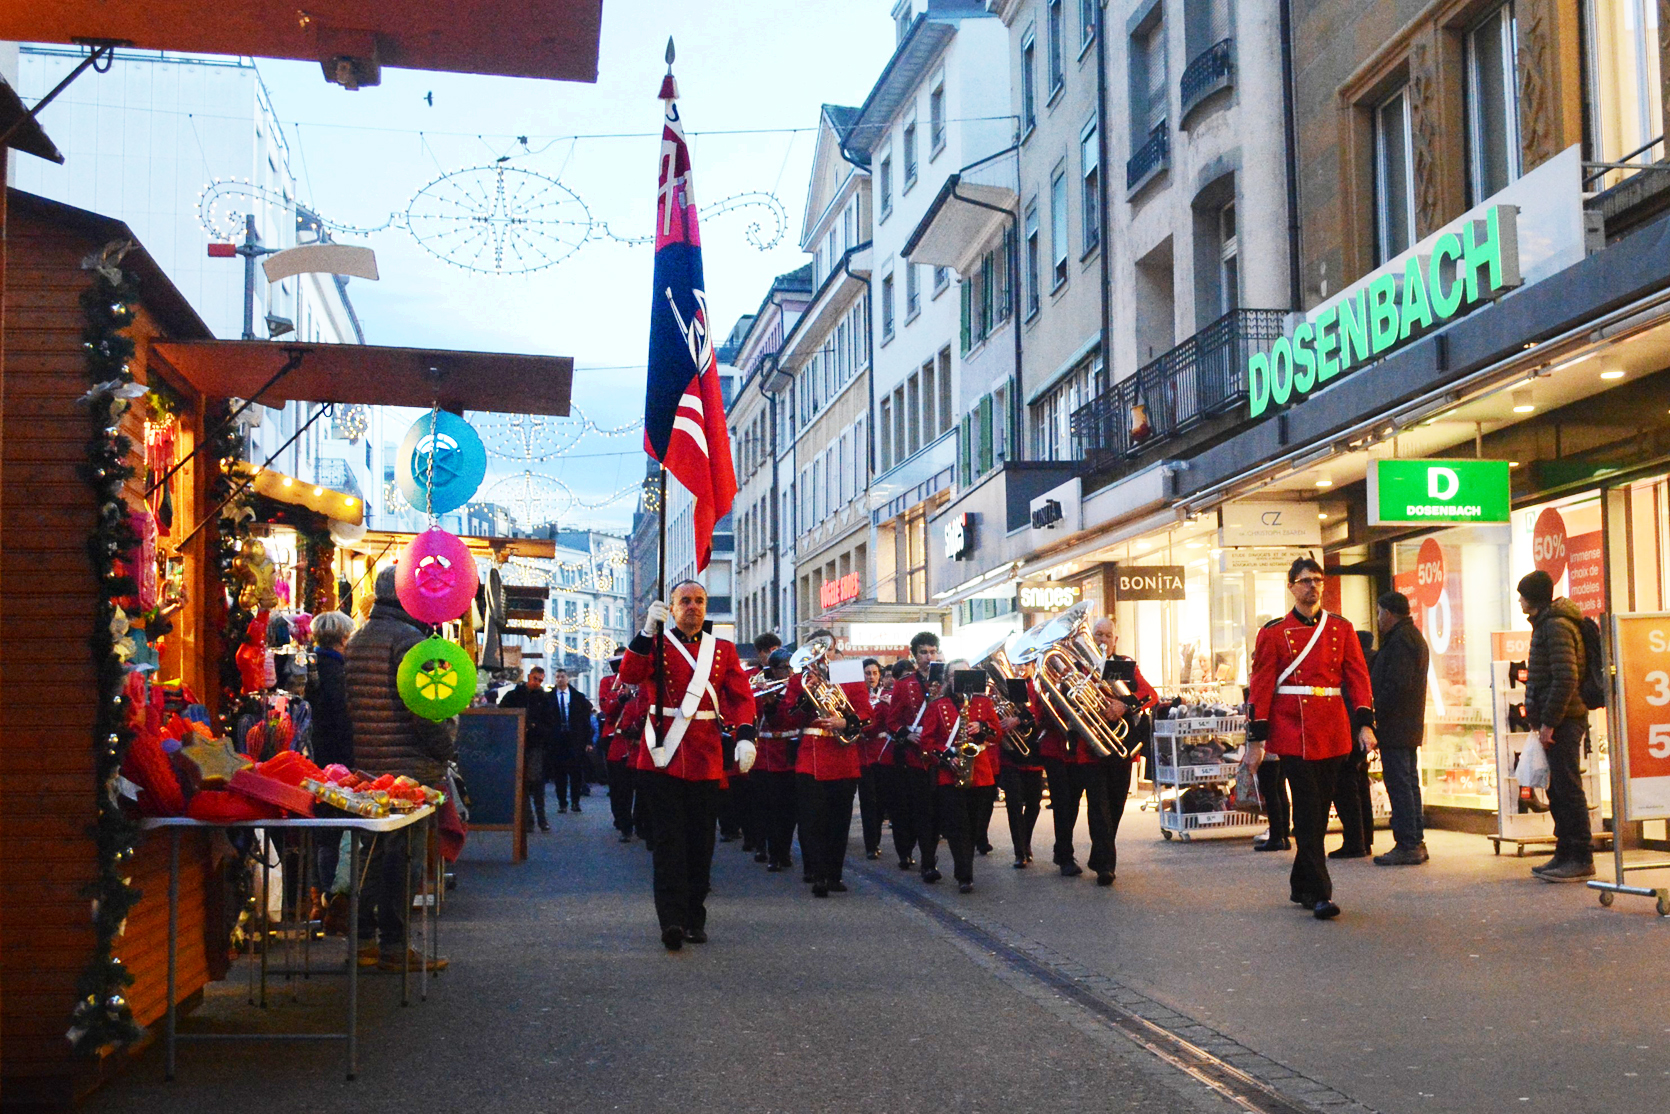 Die Stadtmusik Biel führt die geladenen Gäste an